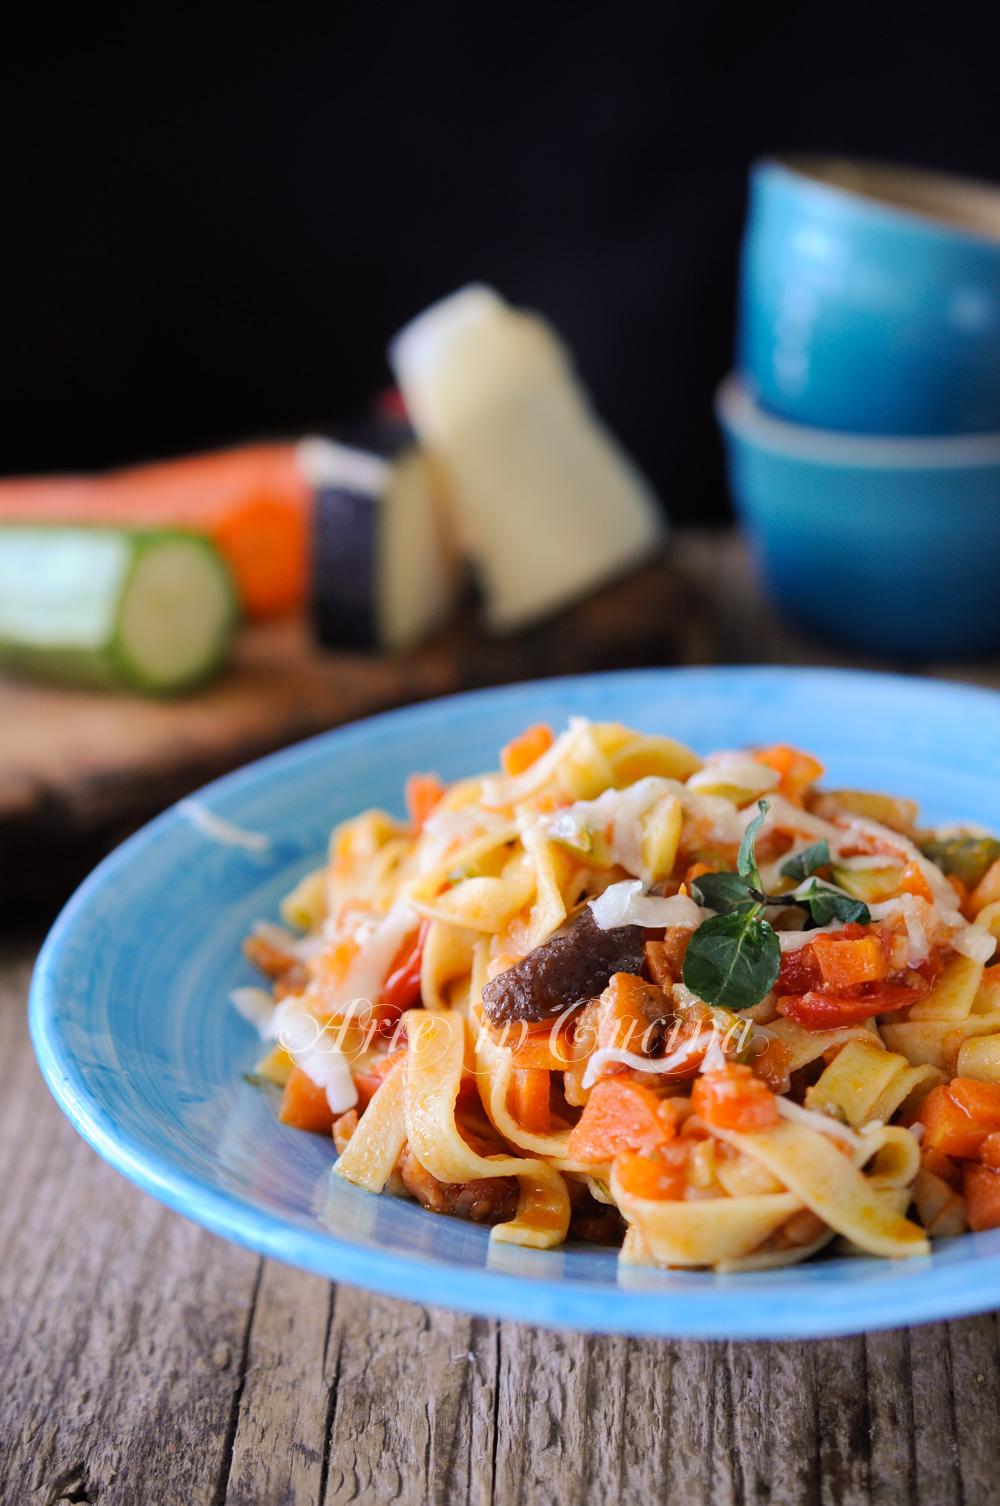 Tagliatelle al ragu di verdure facile e veloce vickyart arte in cucina